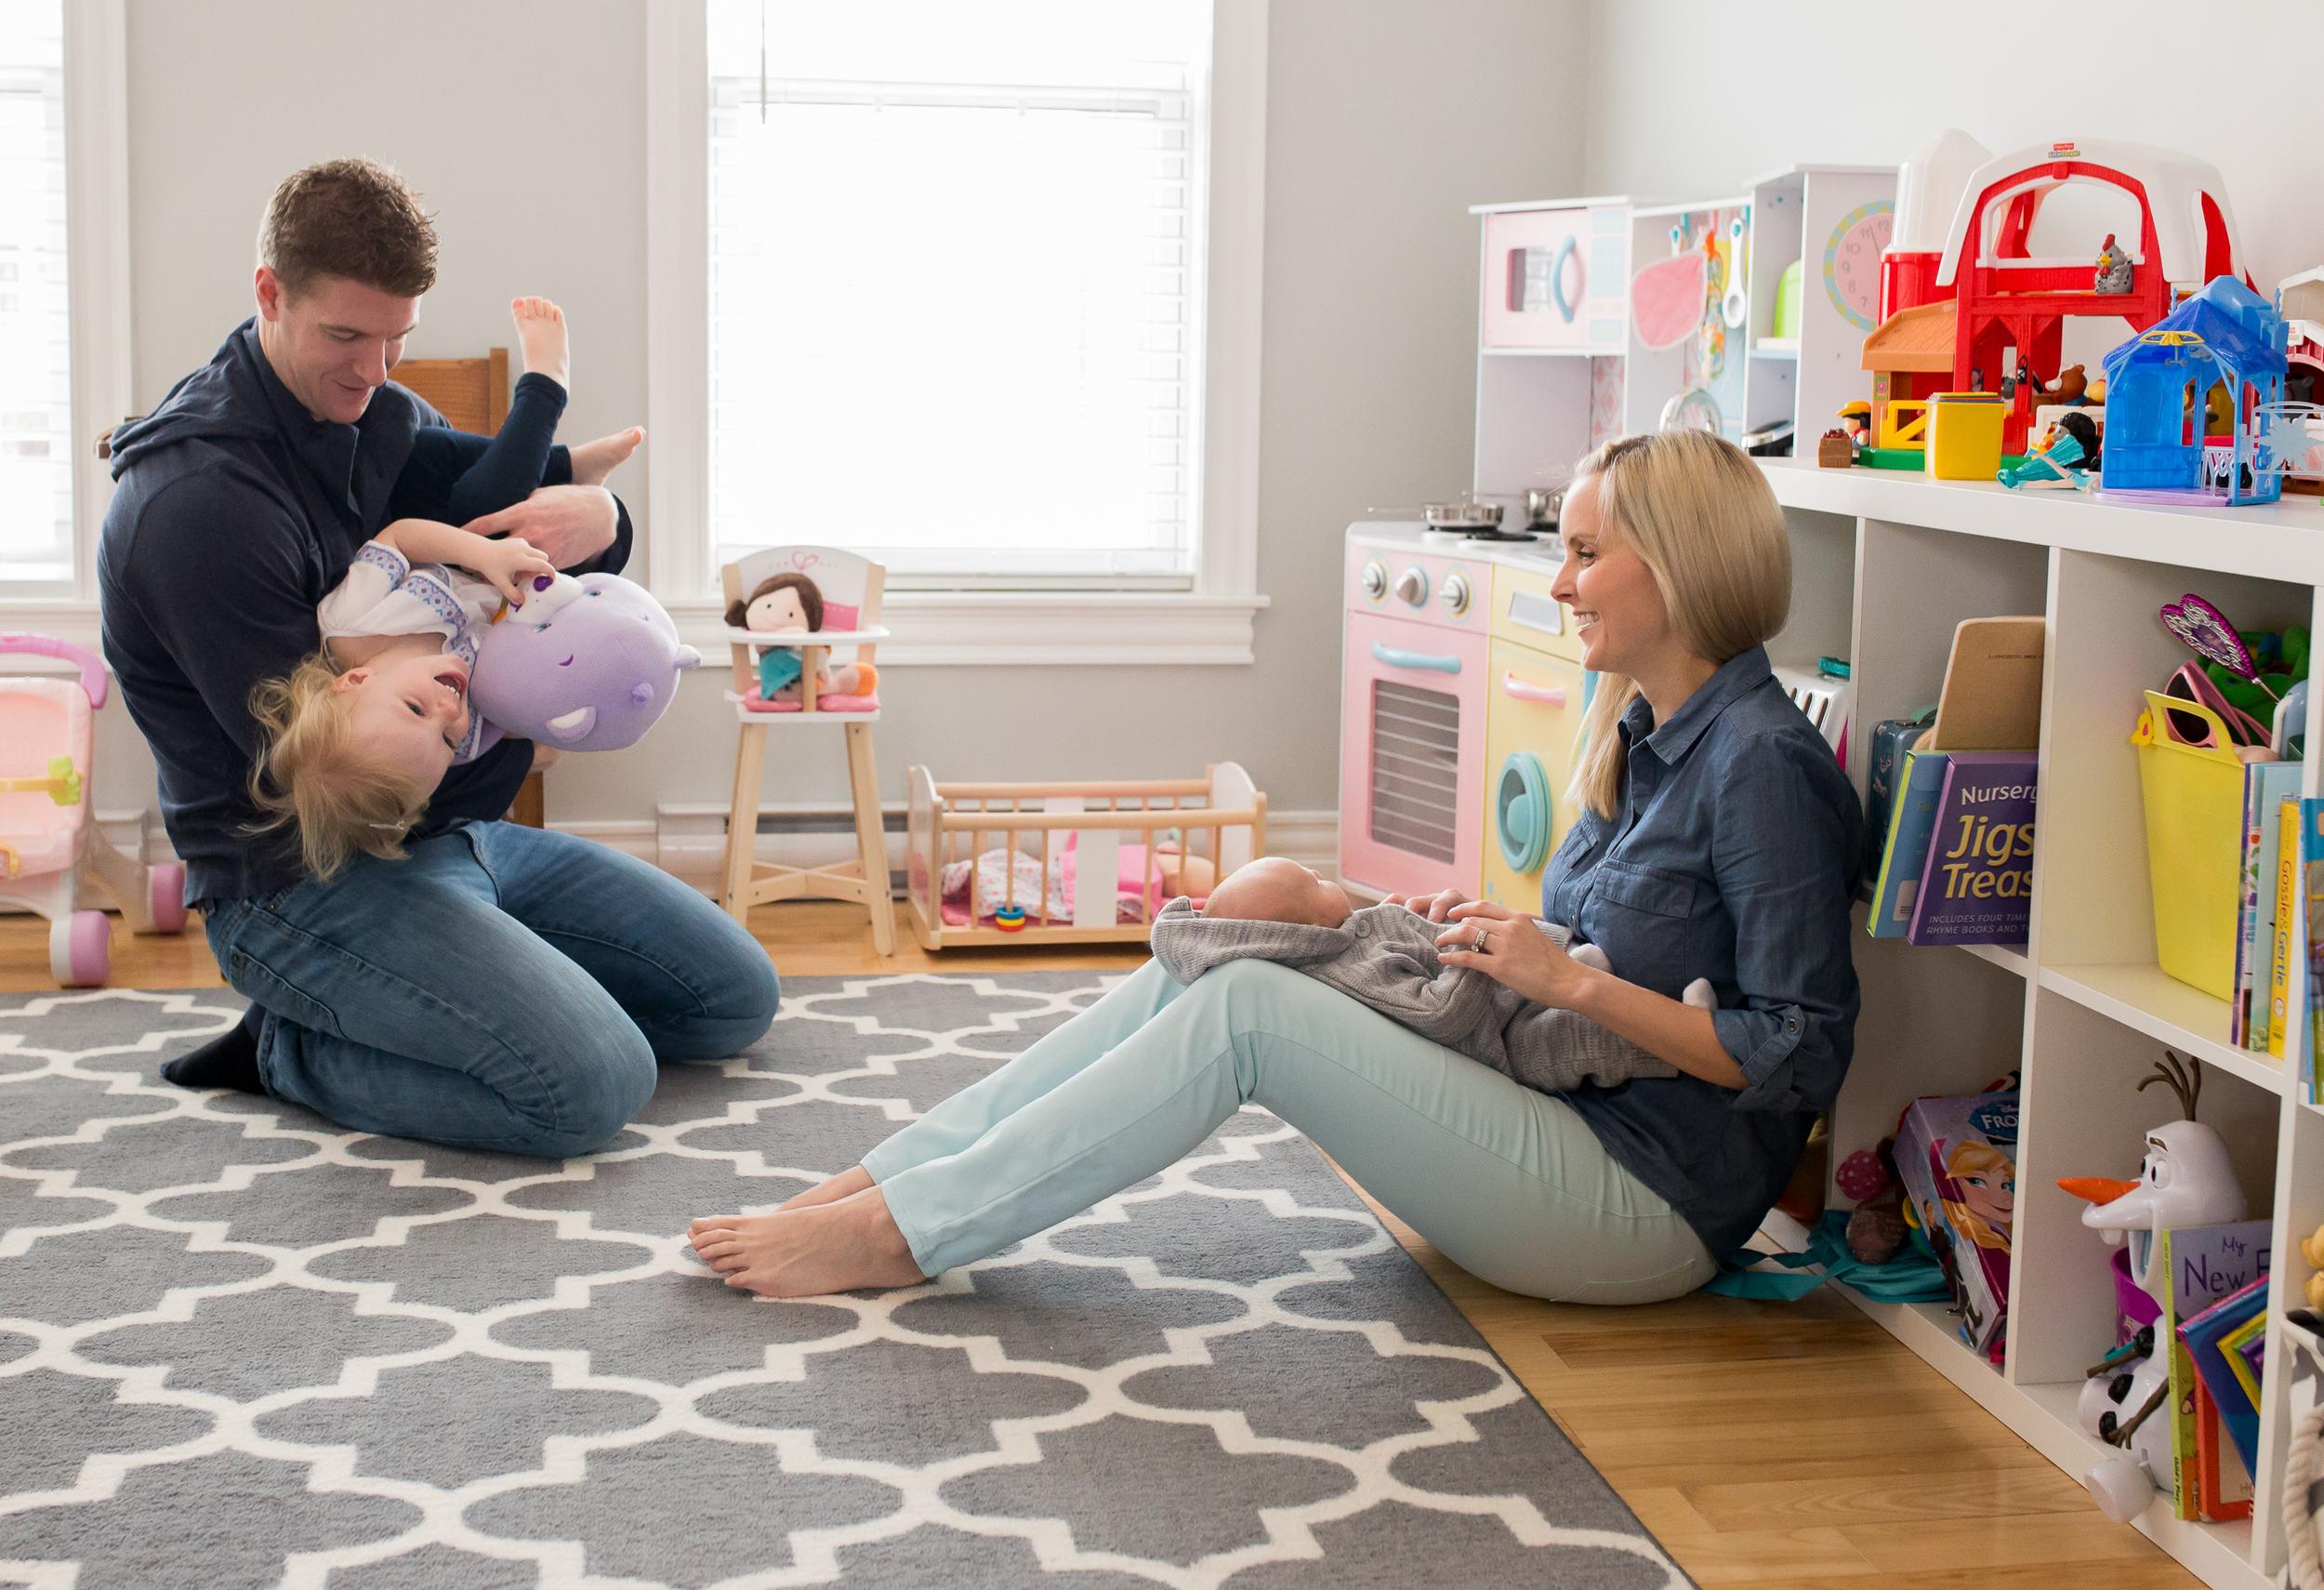 Moncton Newborn Baby - Lifestyle Family Photographer